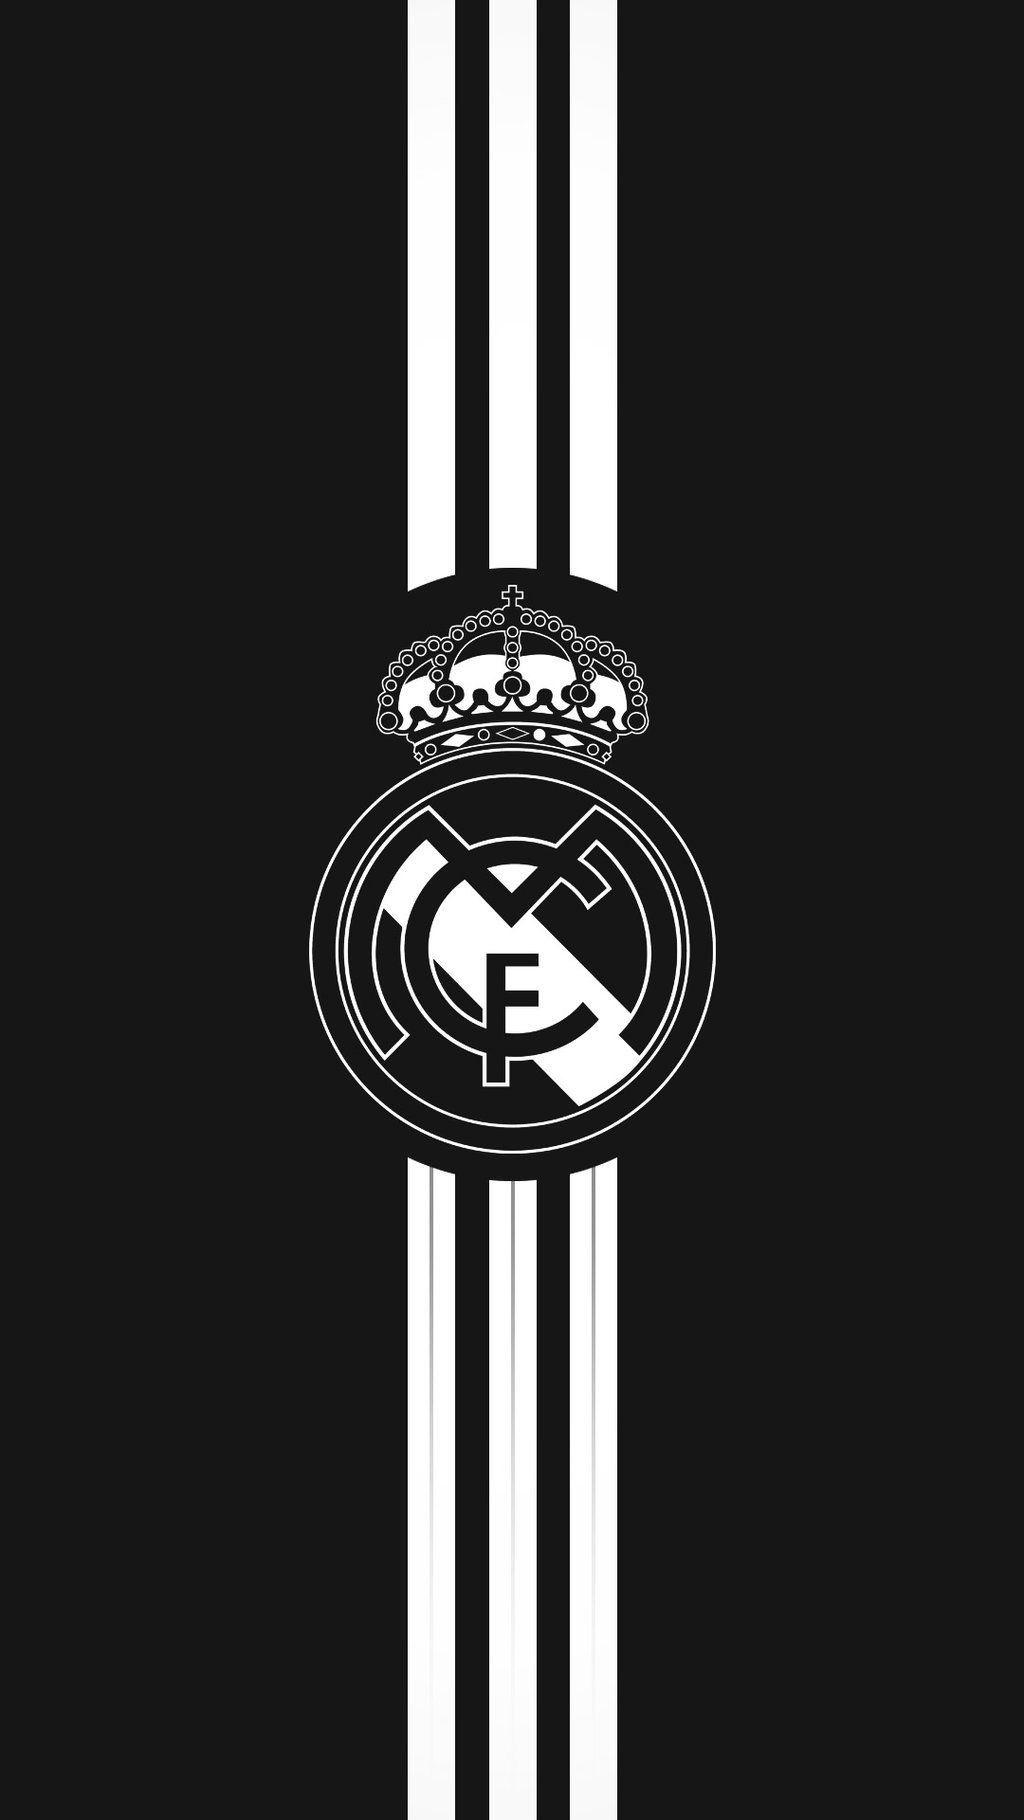 Fond d écran Réal Madrid 2016   2017   Wallpapers   Pinterest   Real ... 3da5cefa82d